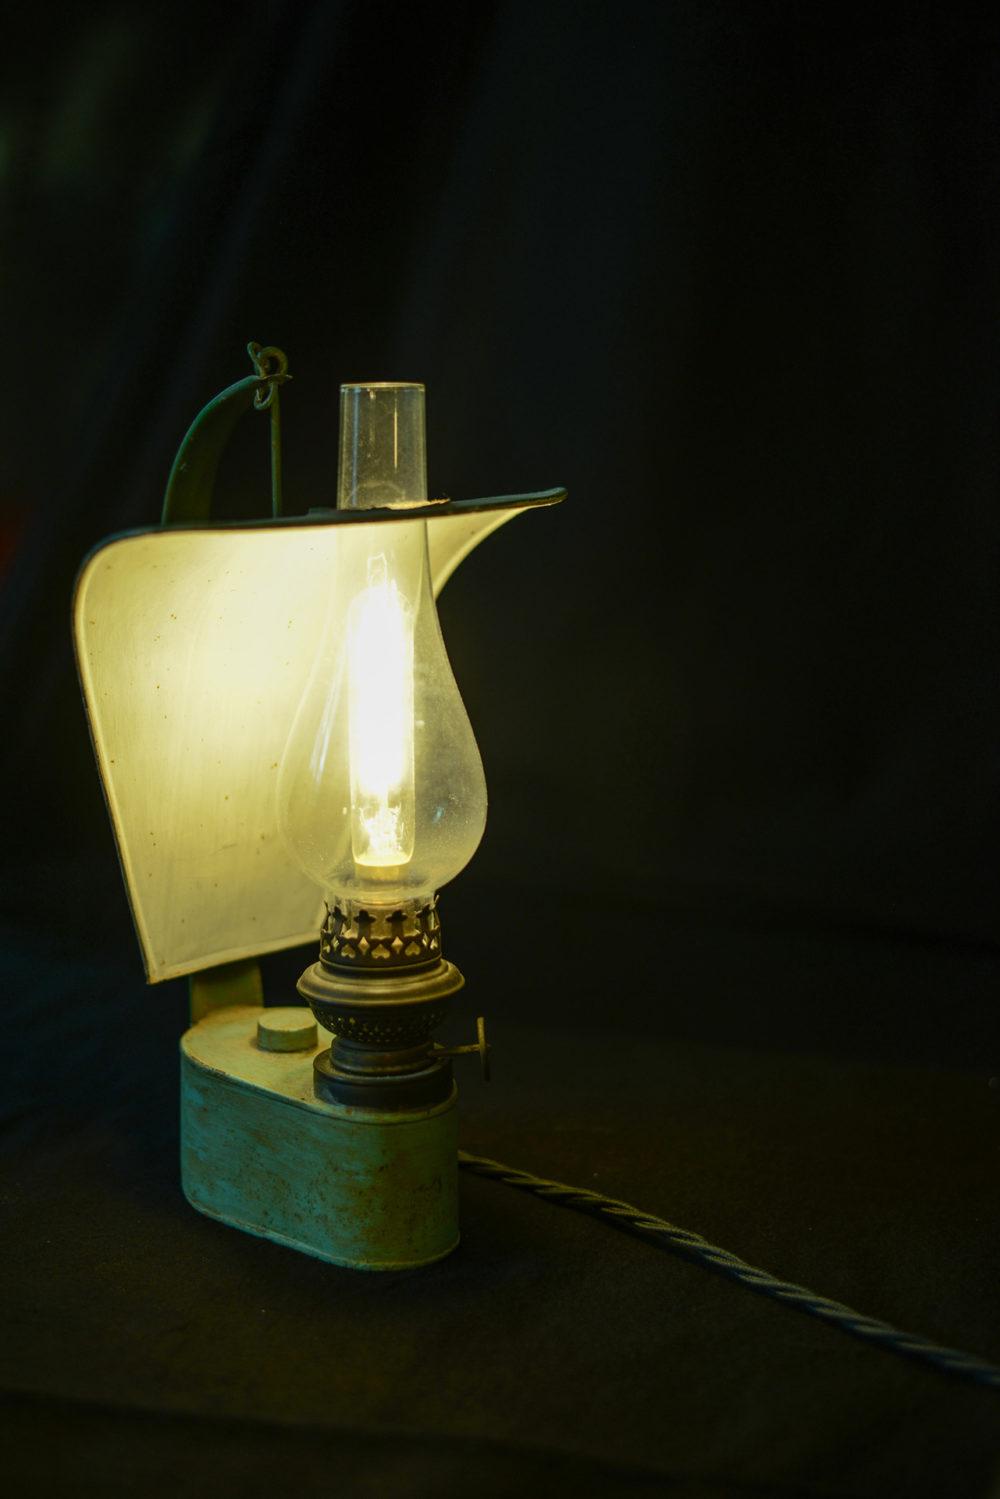 recycling lampe aus petrollampe